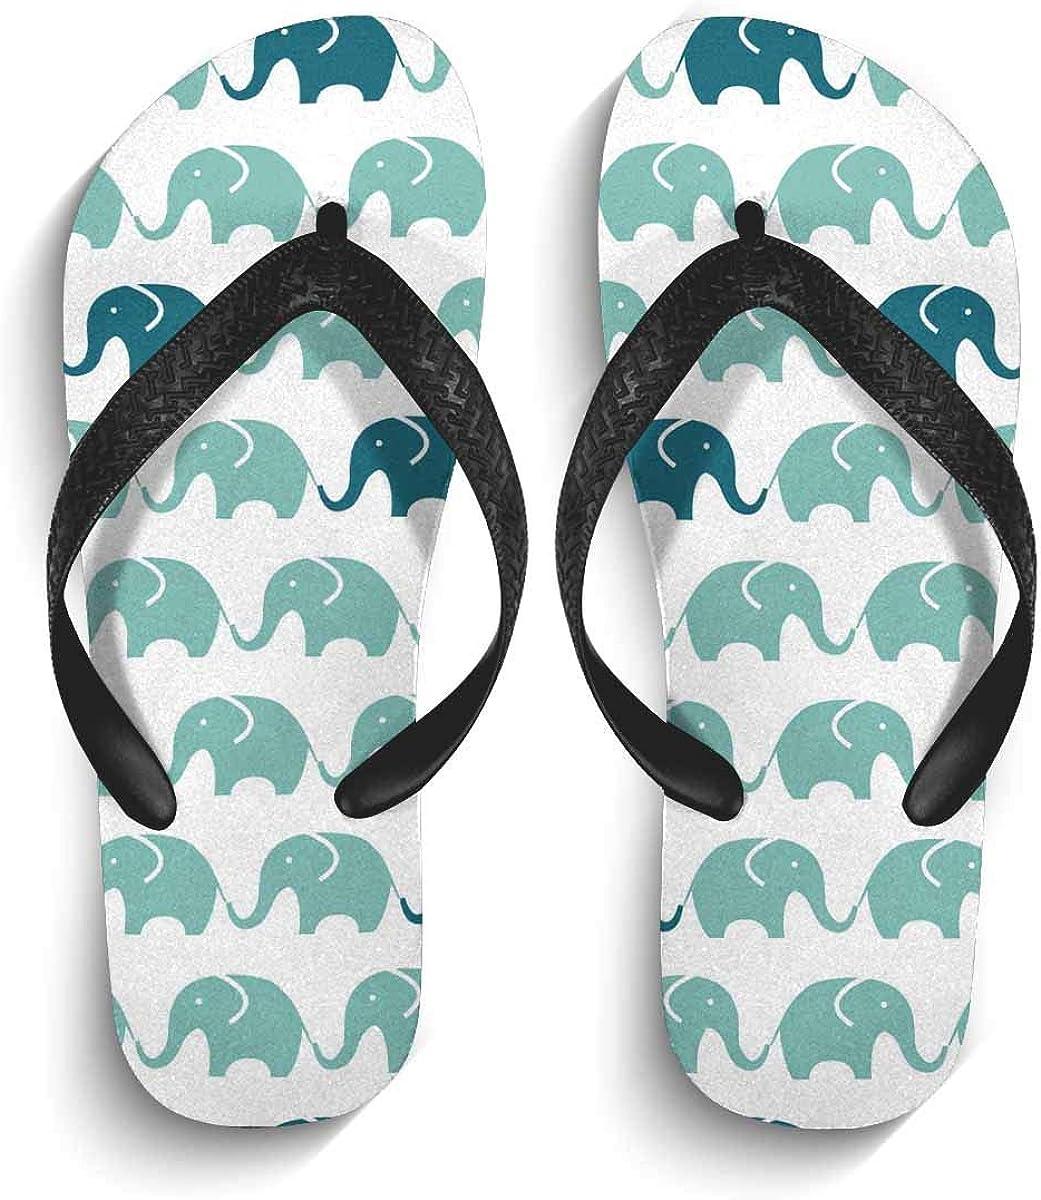 InterestPrint Men's Non-Slip Flip Flops Blue and Grey Cute Elephants Slim Thong Sandal Outdoor Casual Footwear S